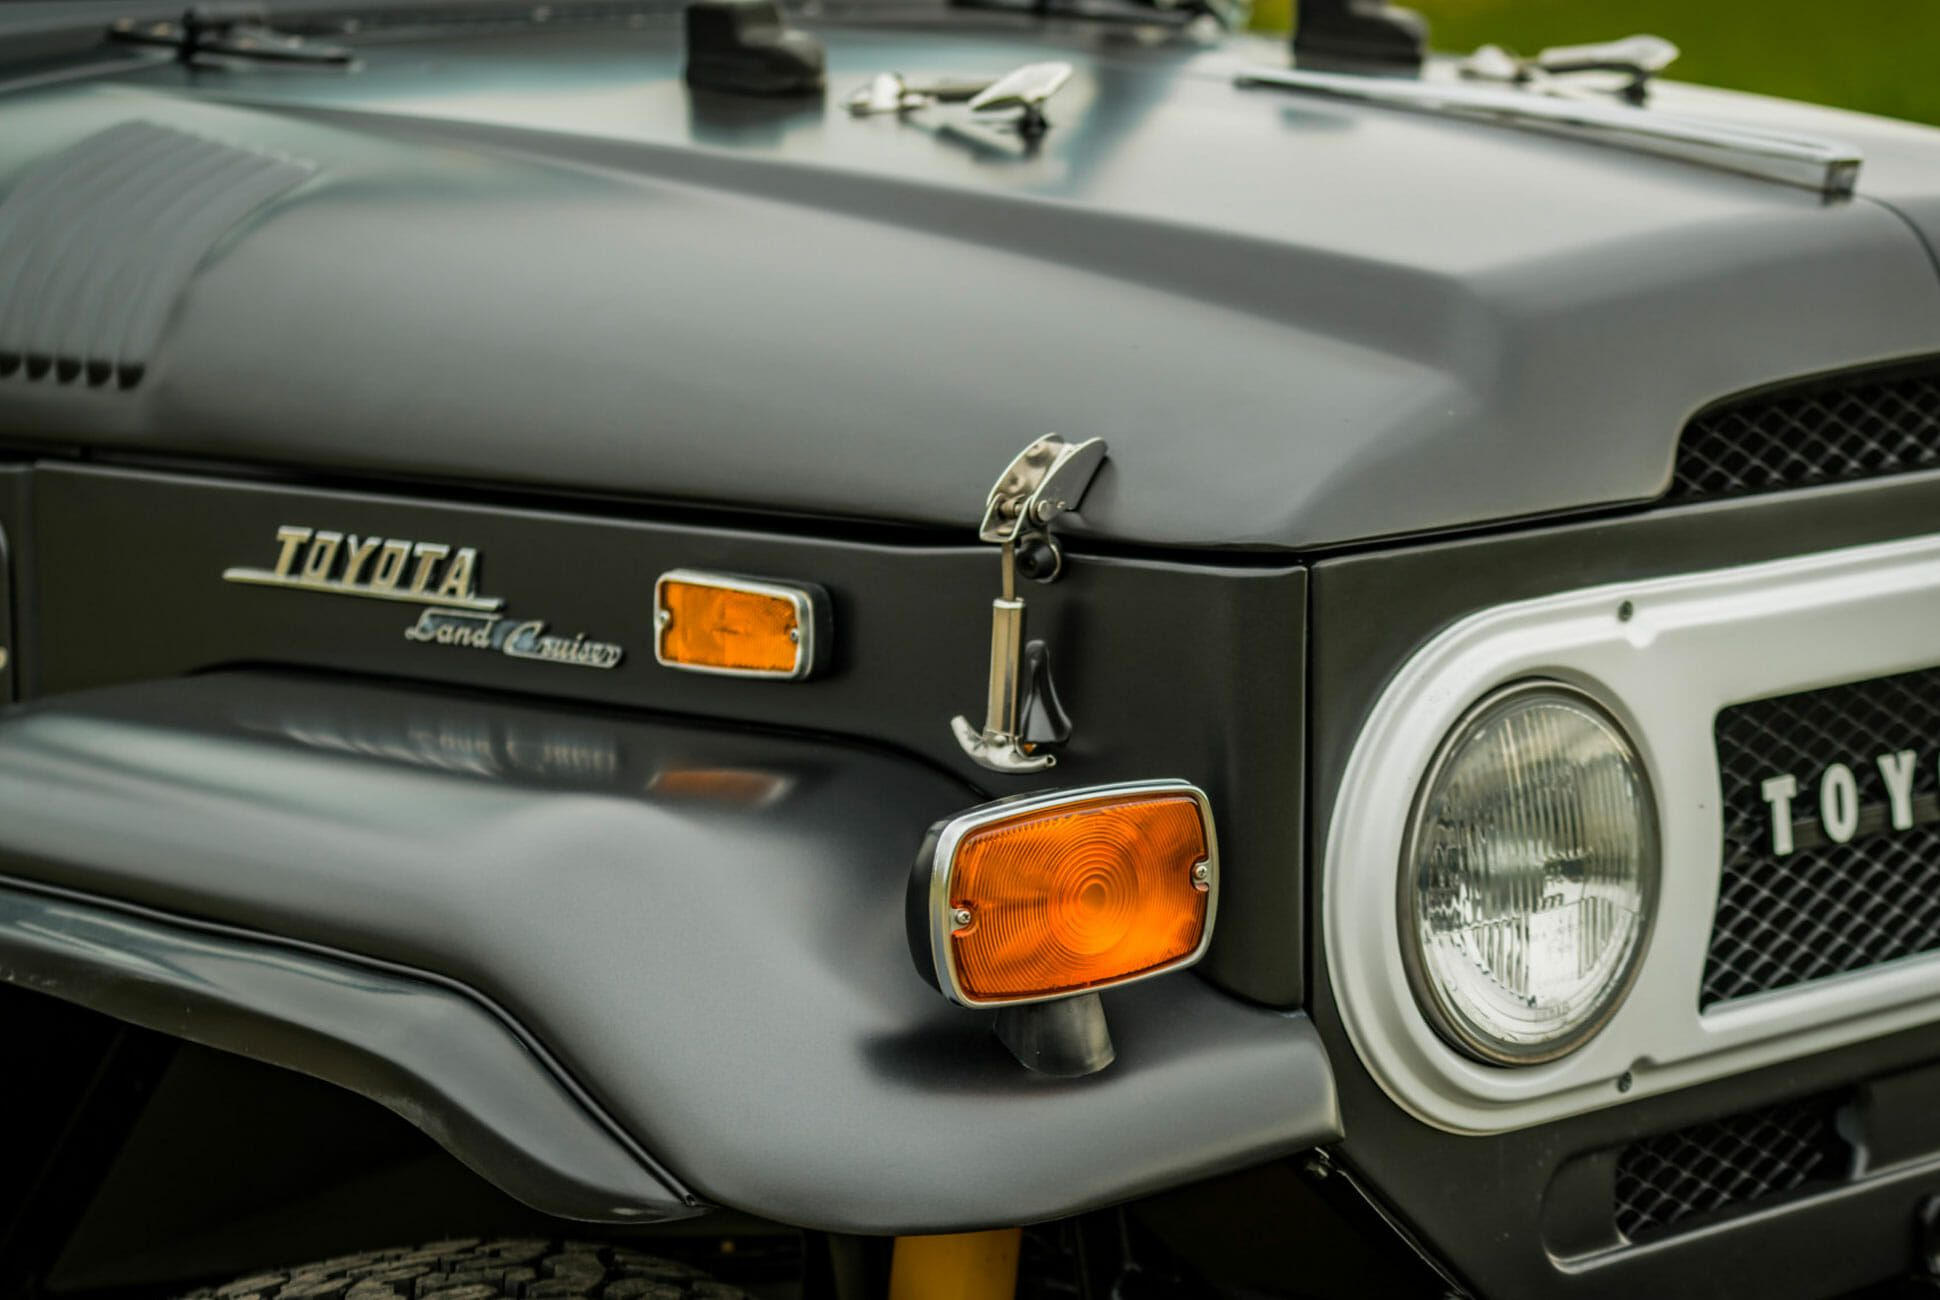 1971-Toyota-Land-Cruiser-FJ40-gear-patrol-slide-6